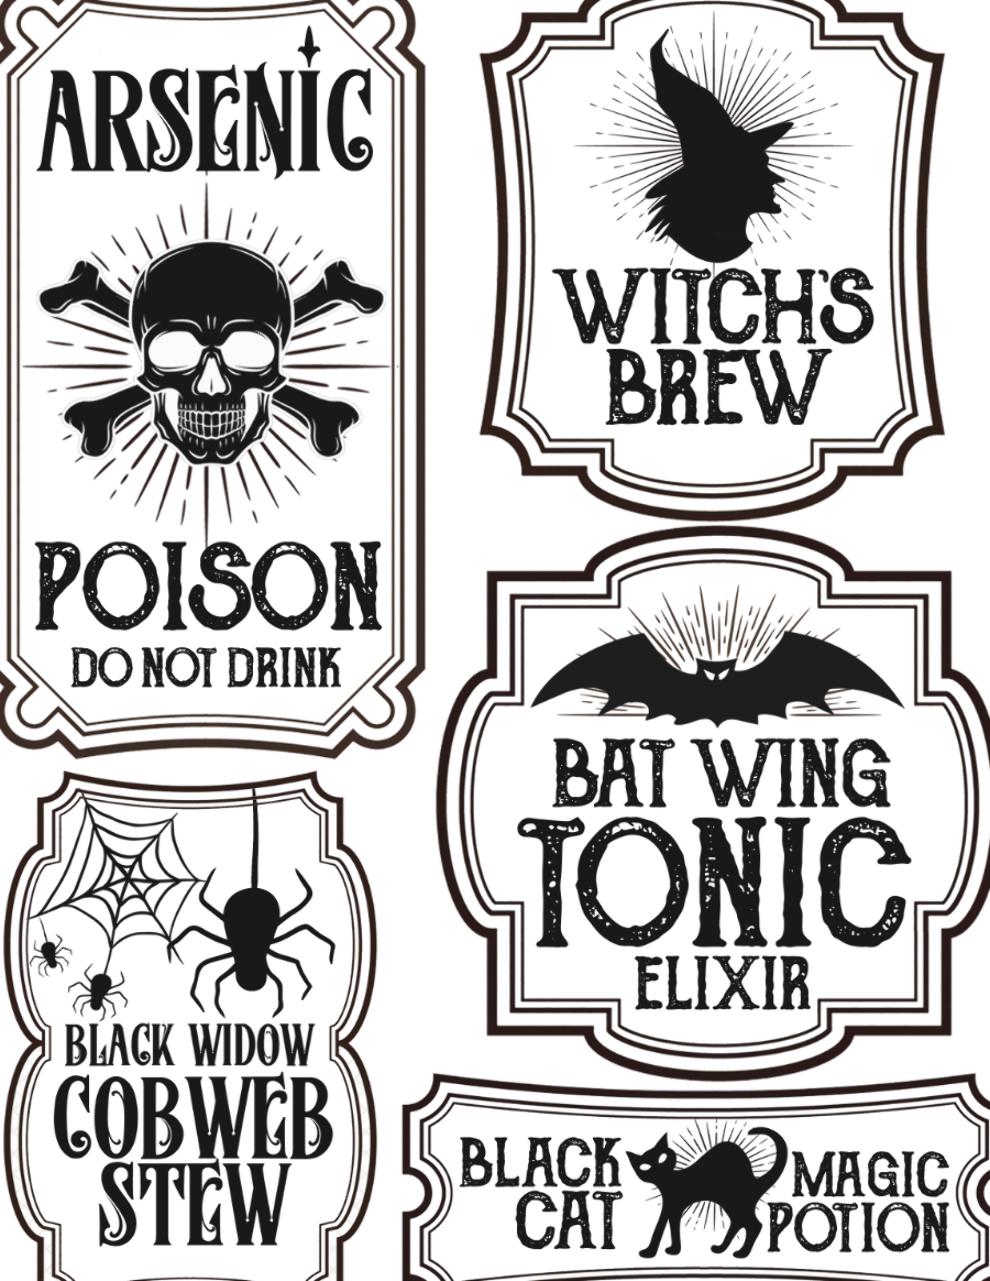 Halloween Bottle Labels Free Printables Potions Labels In 2020 Halloween Bottle Labels Halloween Bottles Halloween Labels